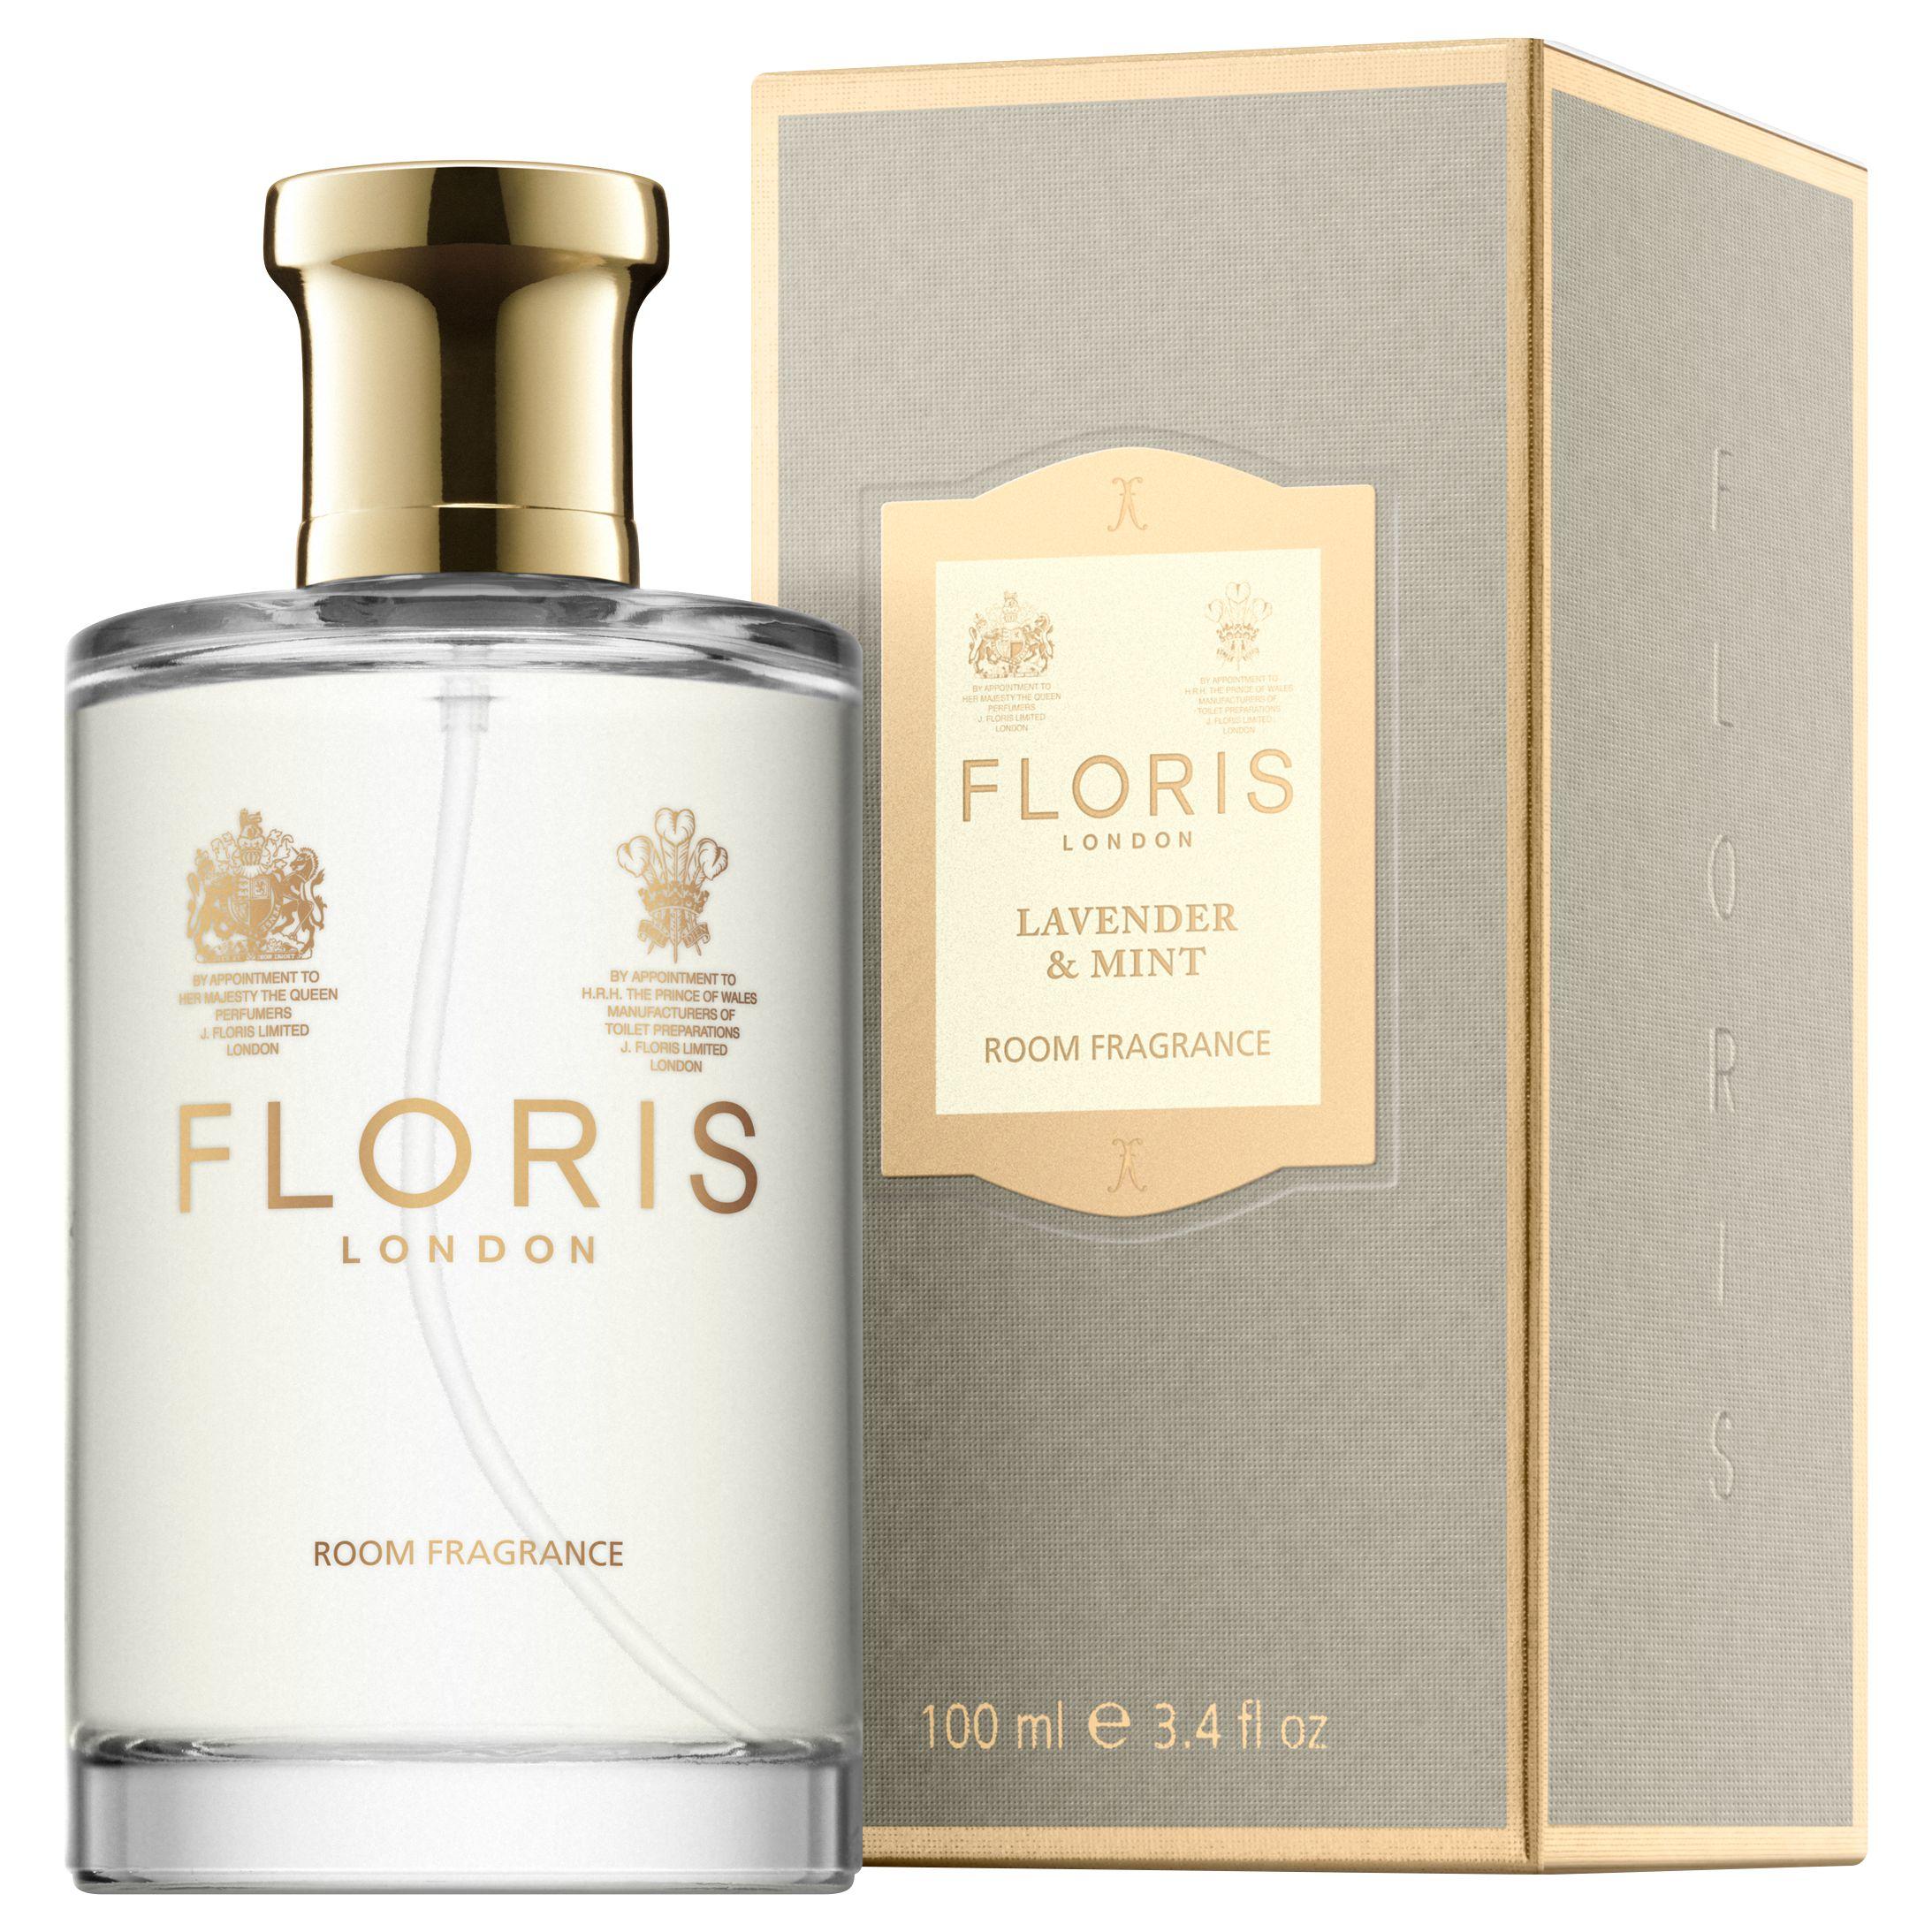 Floris Floris Lavender and Mint Room Fragrance, 100ml